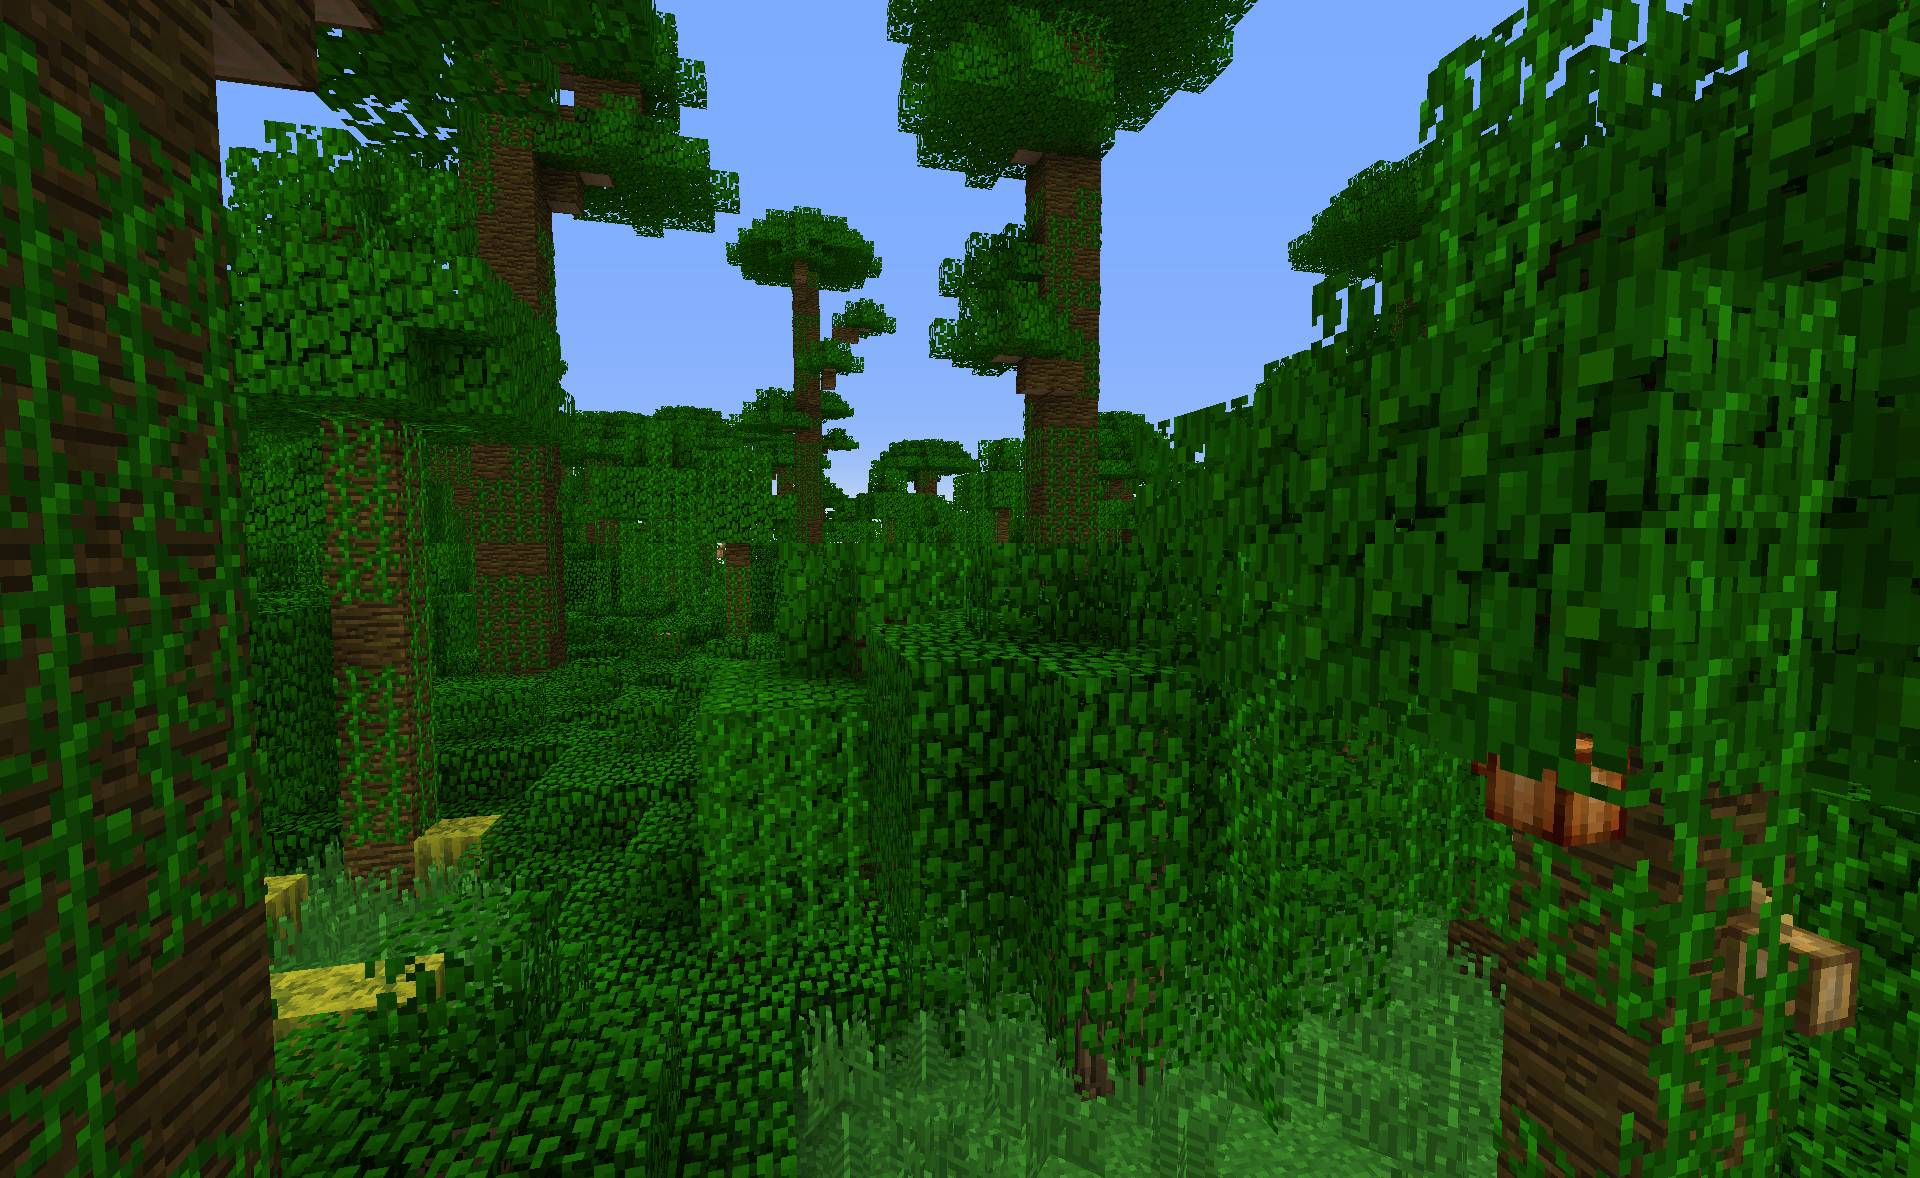 мыши джунглей майнкрафте